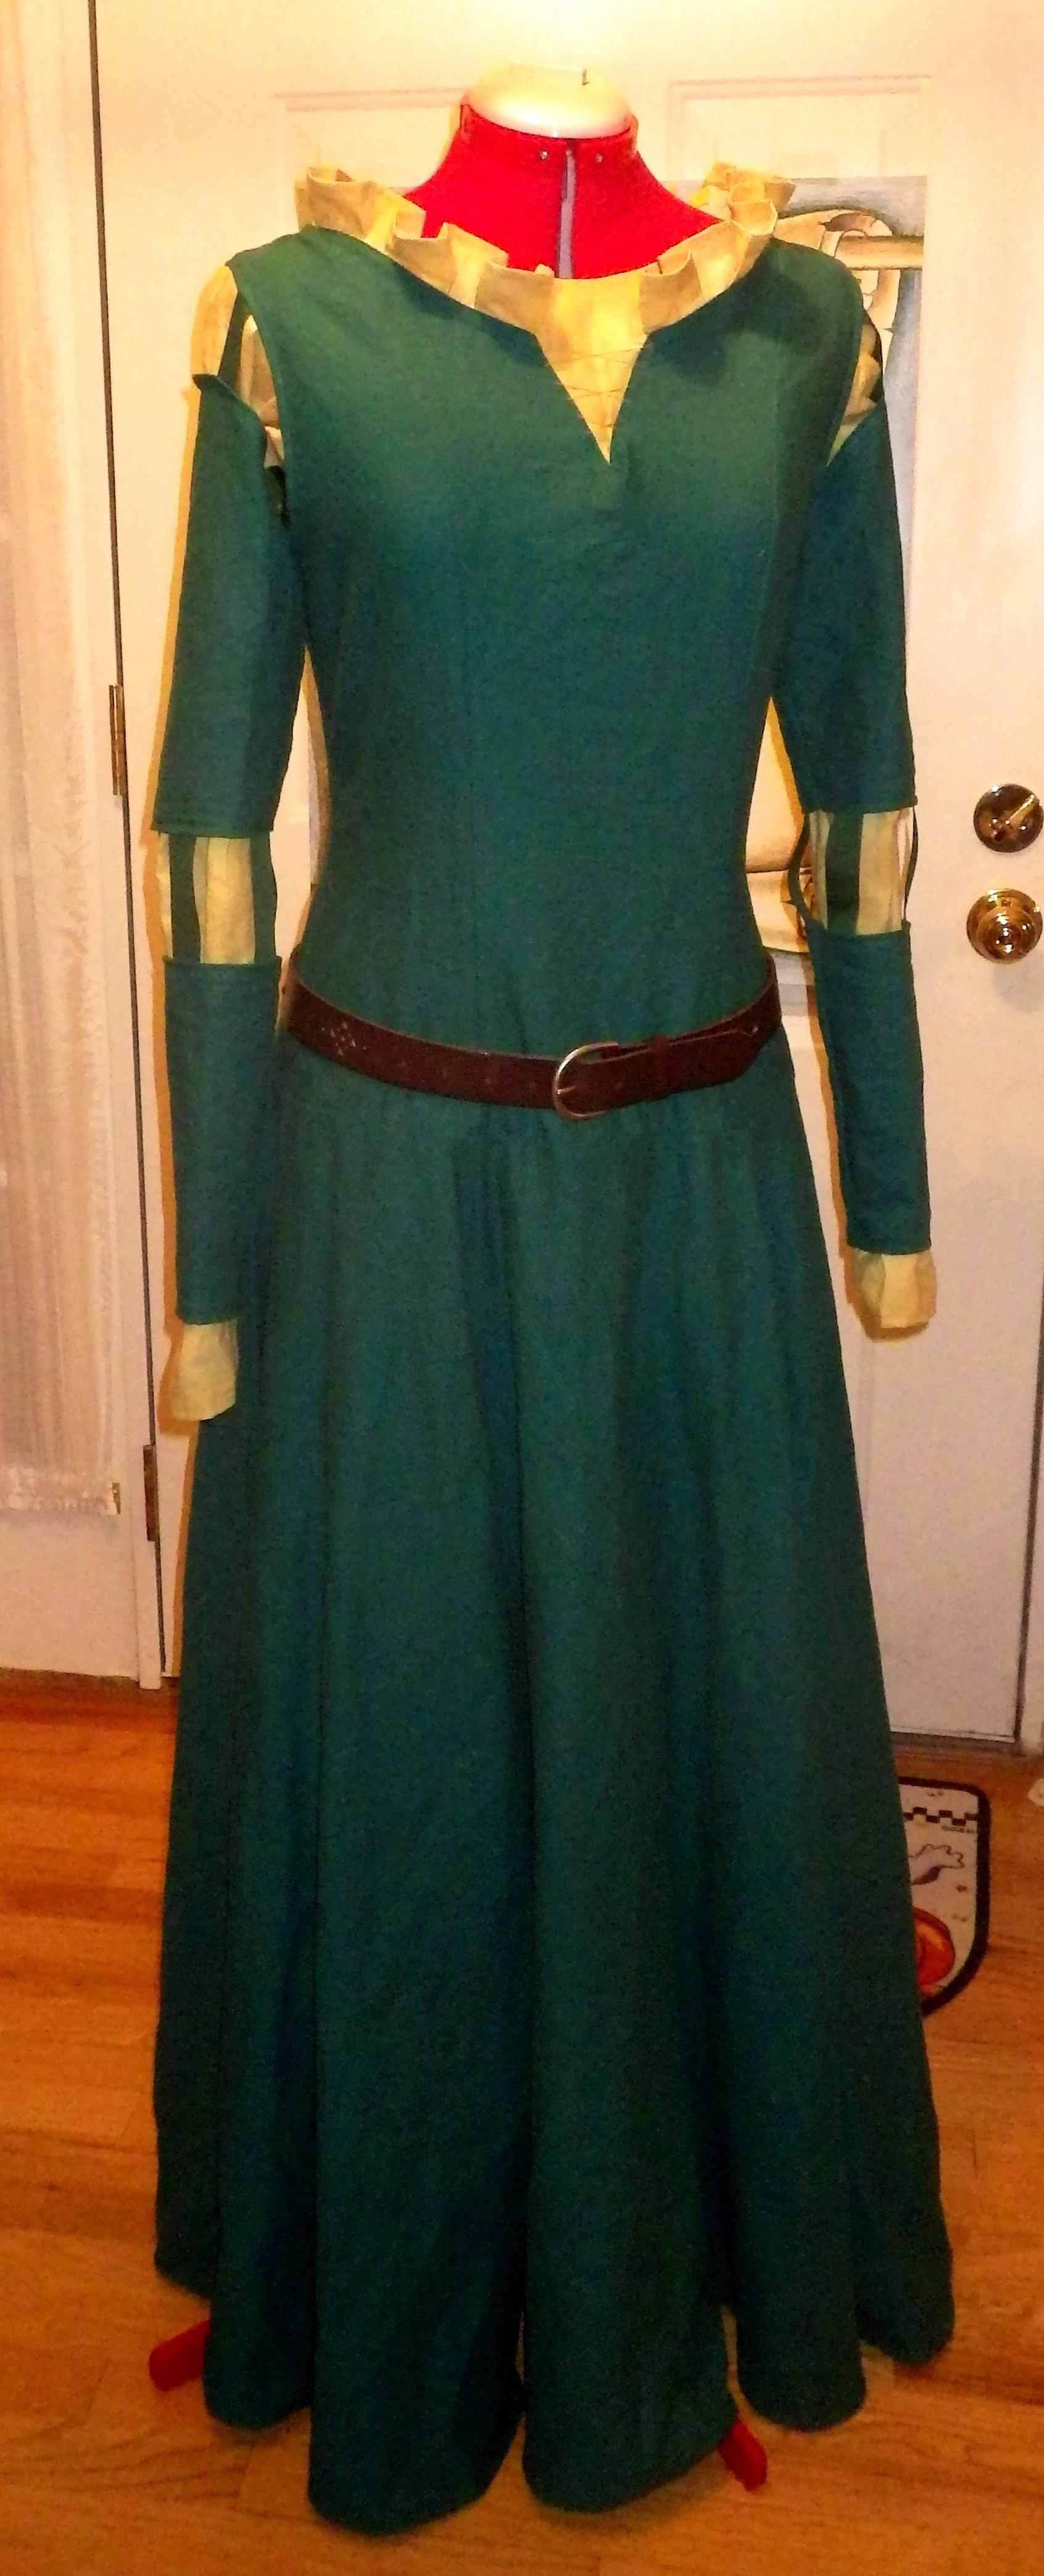 Diy Merida Costume Merida Dress Disney S Brave By Marissonantis Dqb